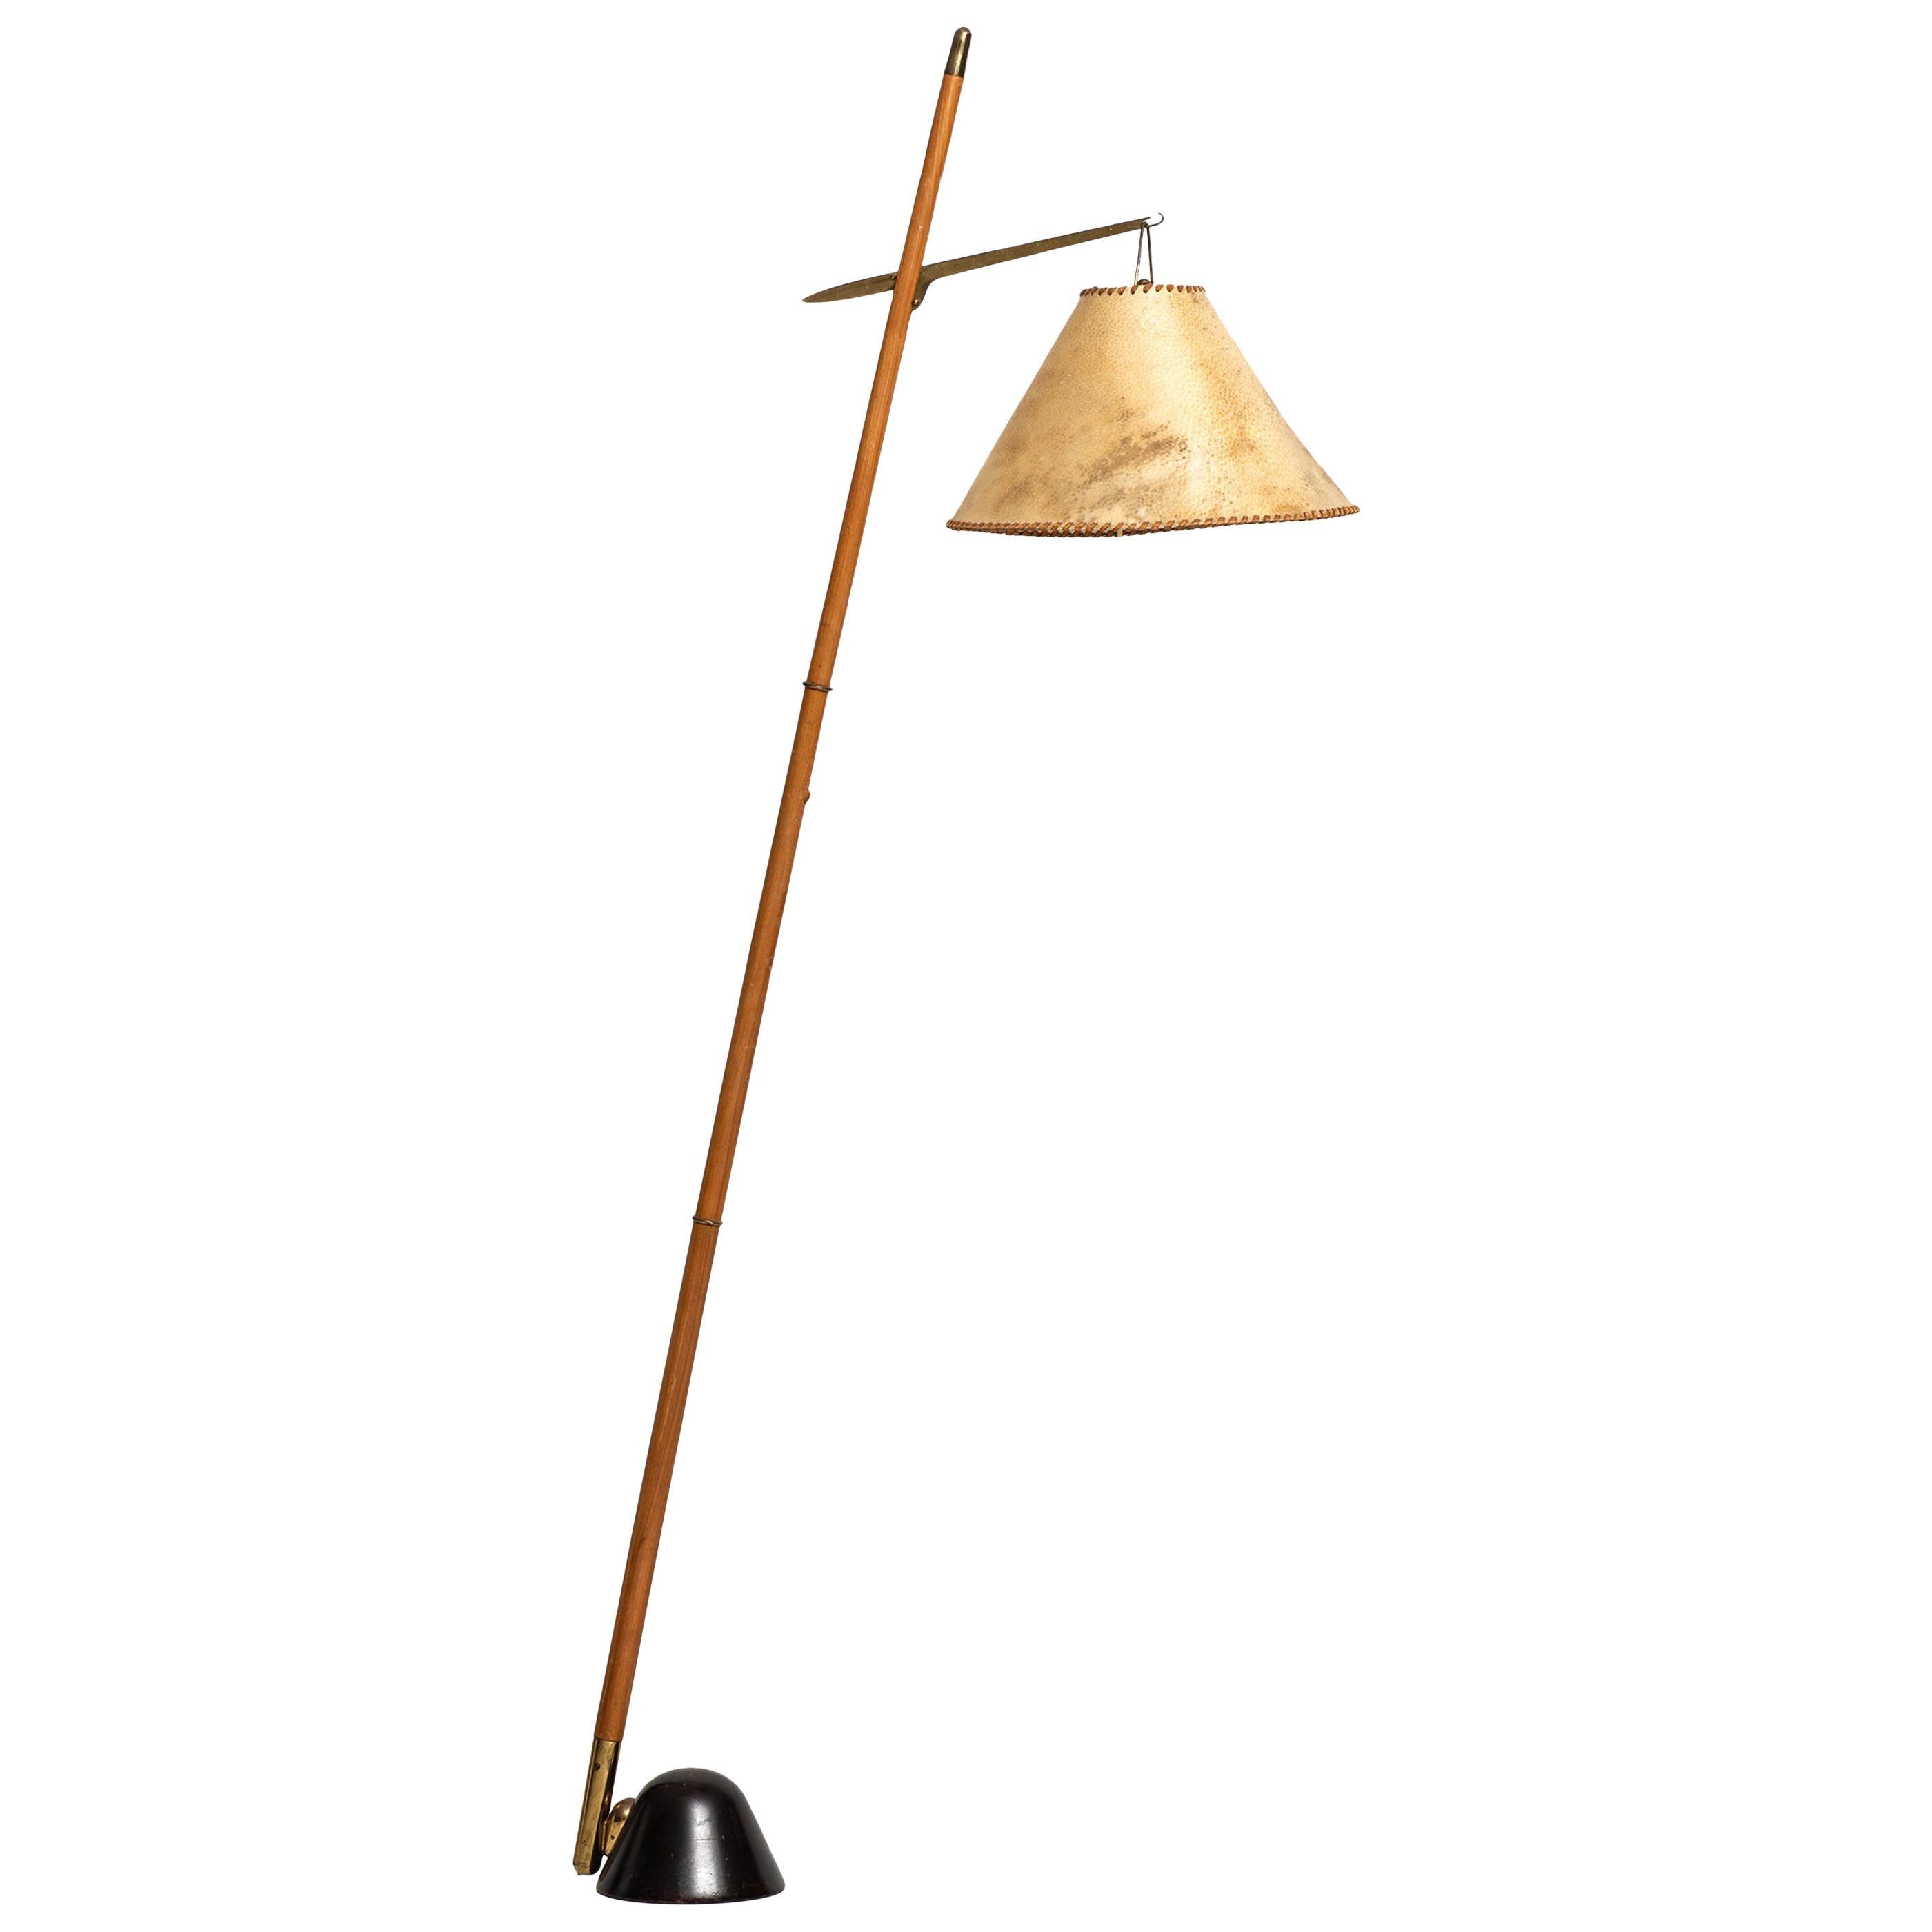 J.T Kalmar Attributed Floor Lamp by J.T Kalmar in Austria